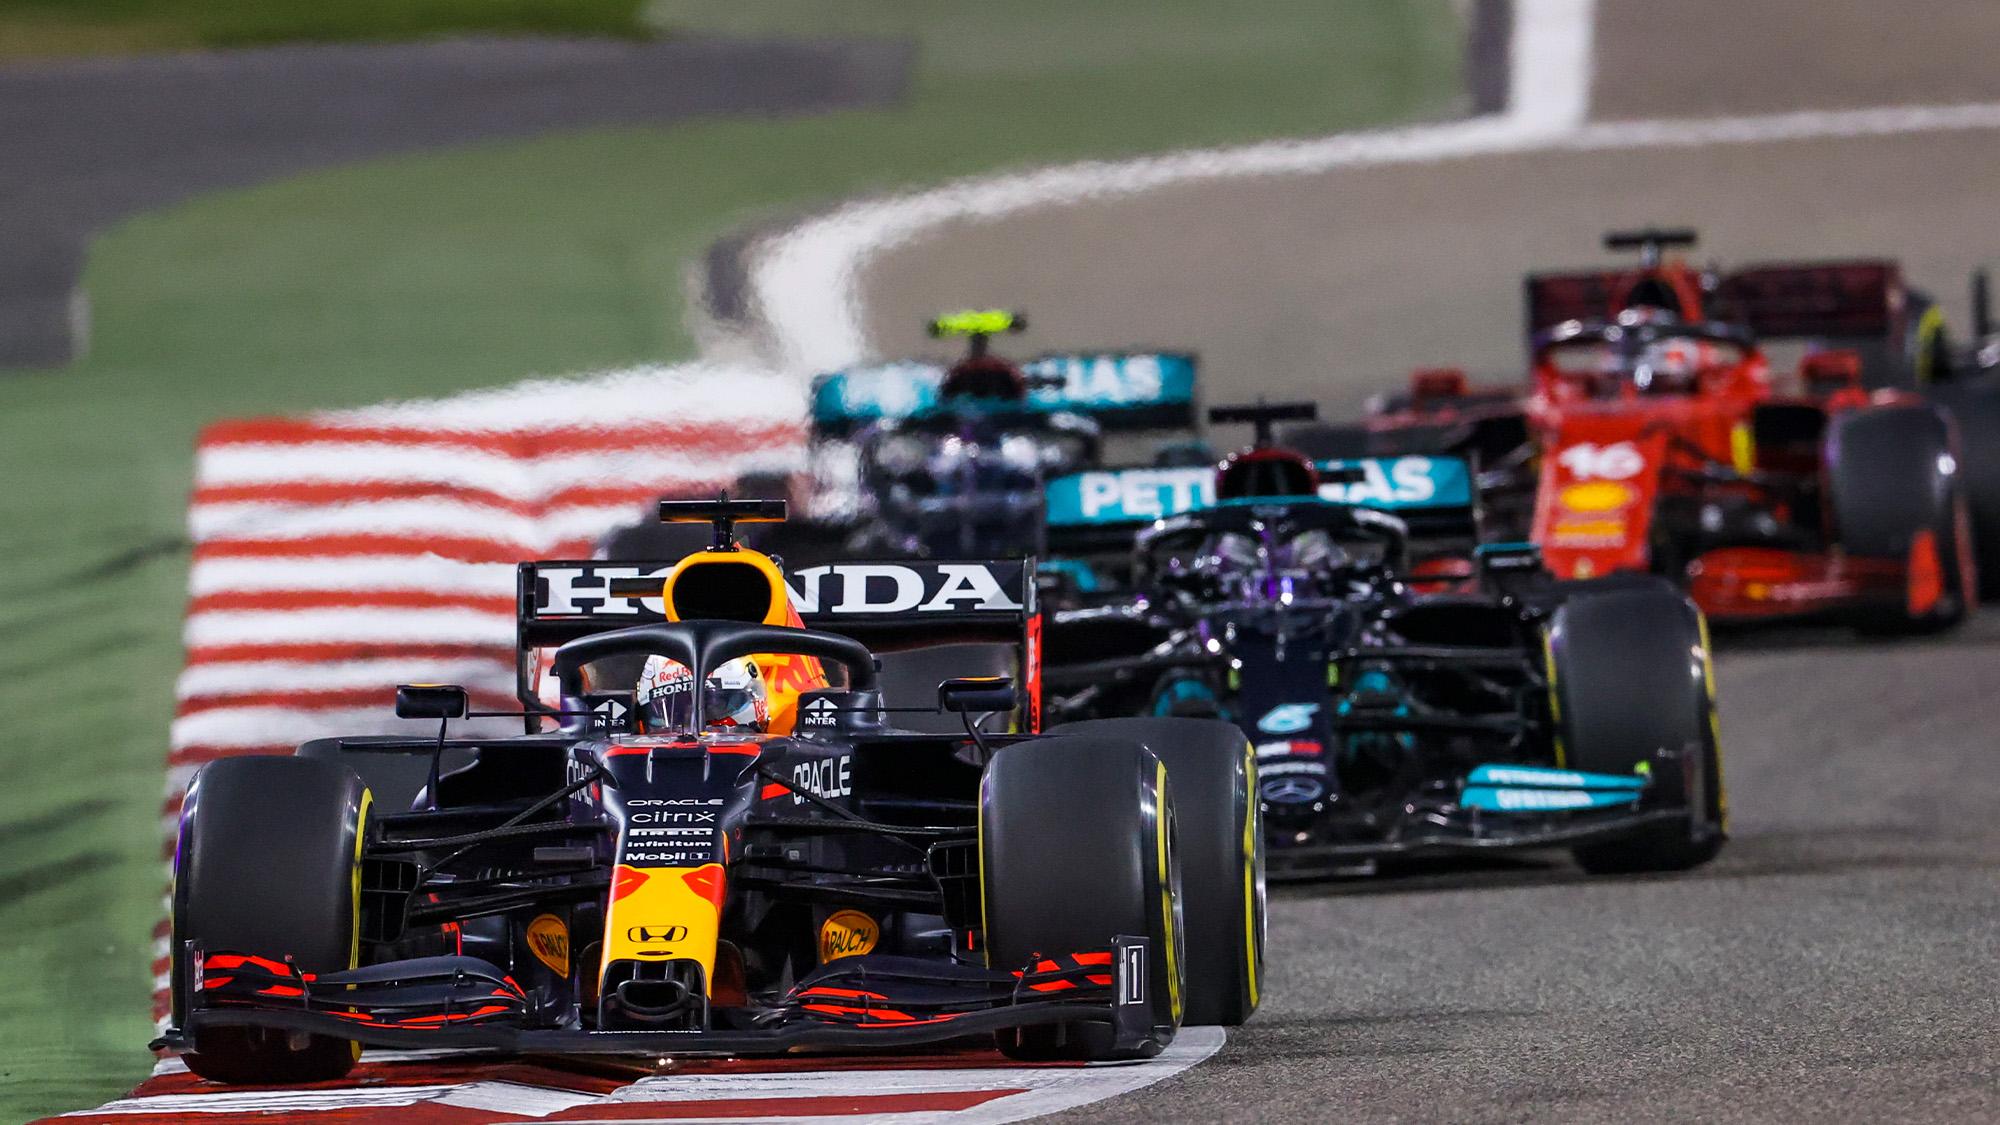 Max Verstappen leads Lewis Hamilton and Valtteri Bottas in the 2021 Bahrain Grand Prix